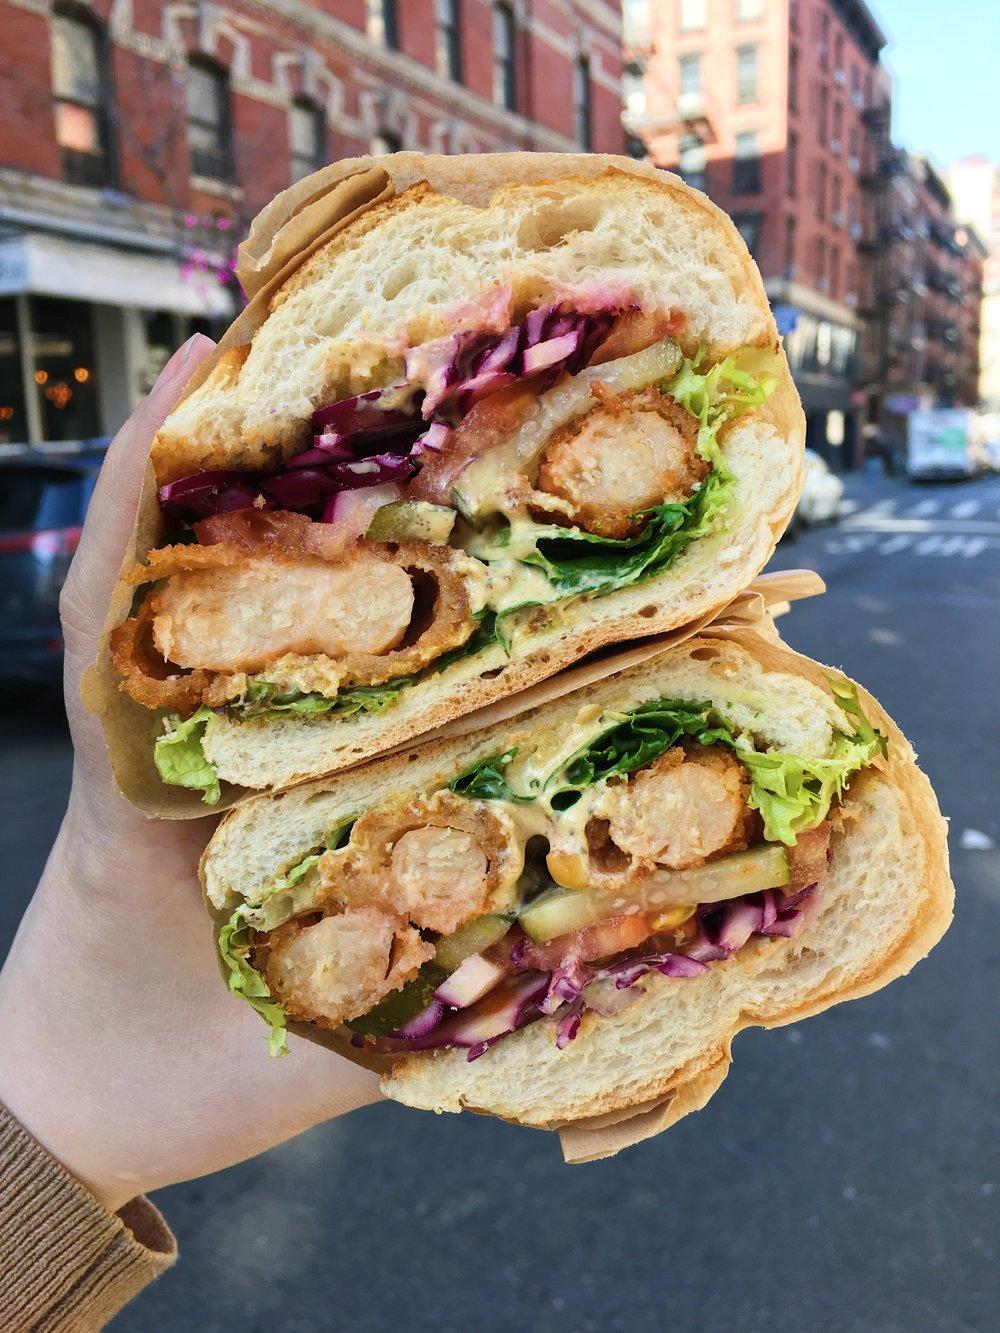 veganpufferfish-orchard-grocer-shrimp-po-boy.jpeg